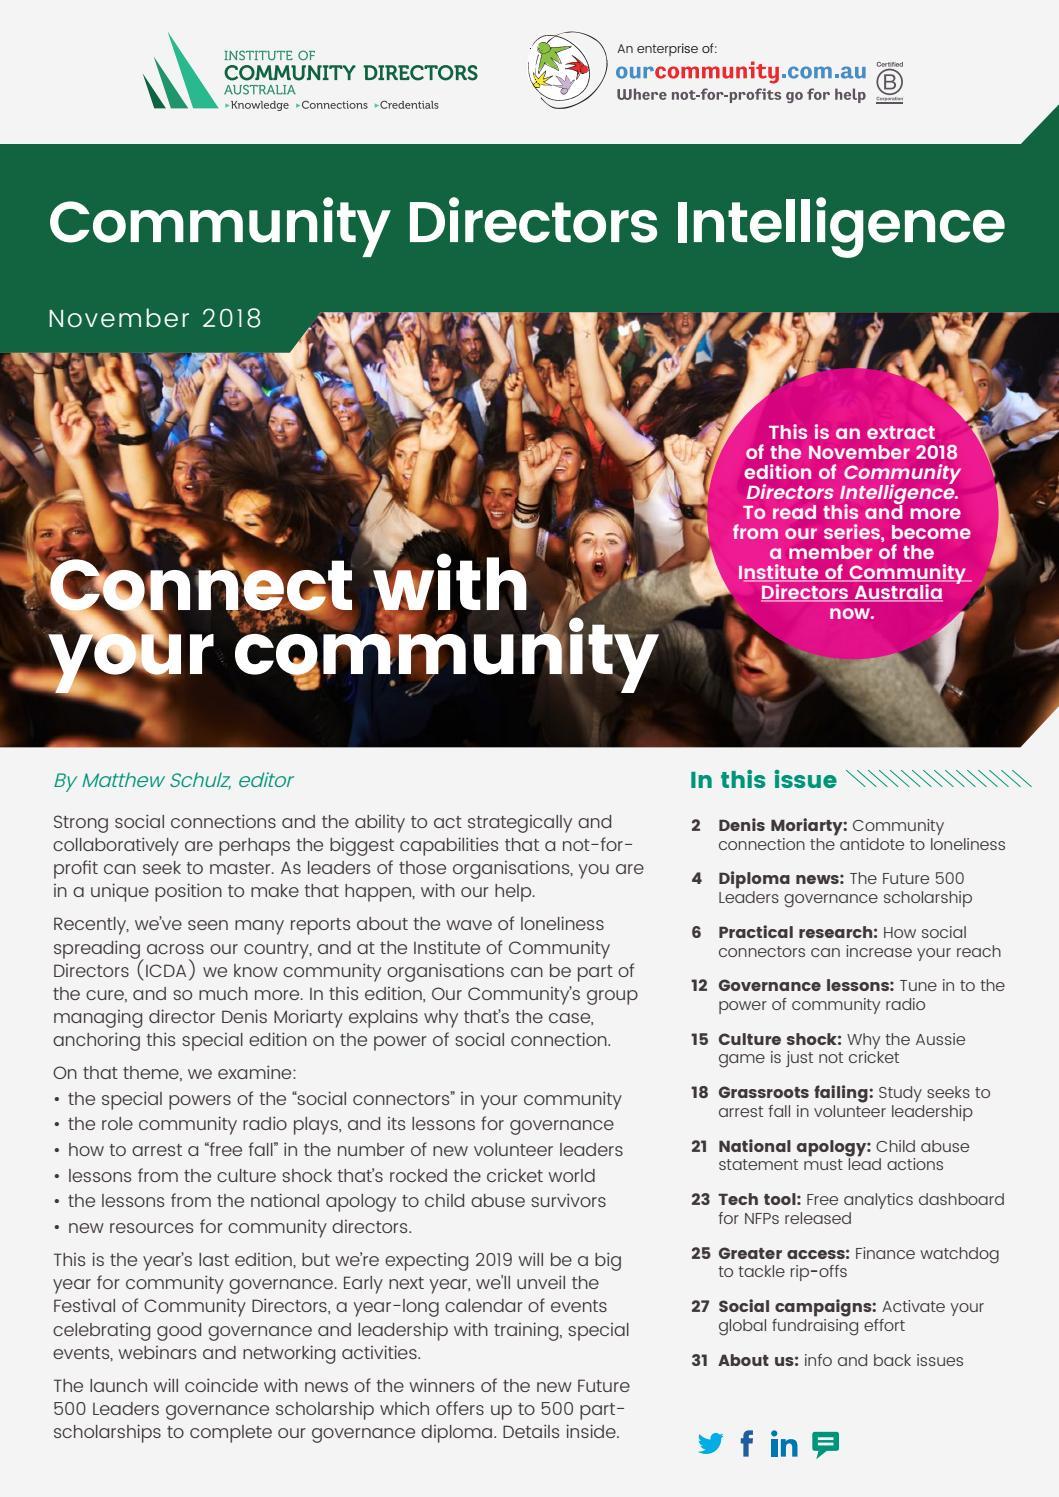 Community Directors Intelligence, November